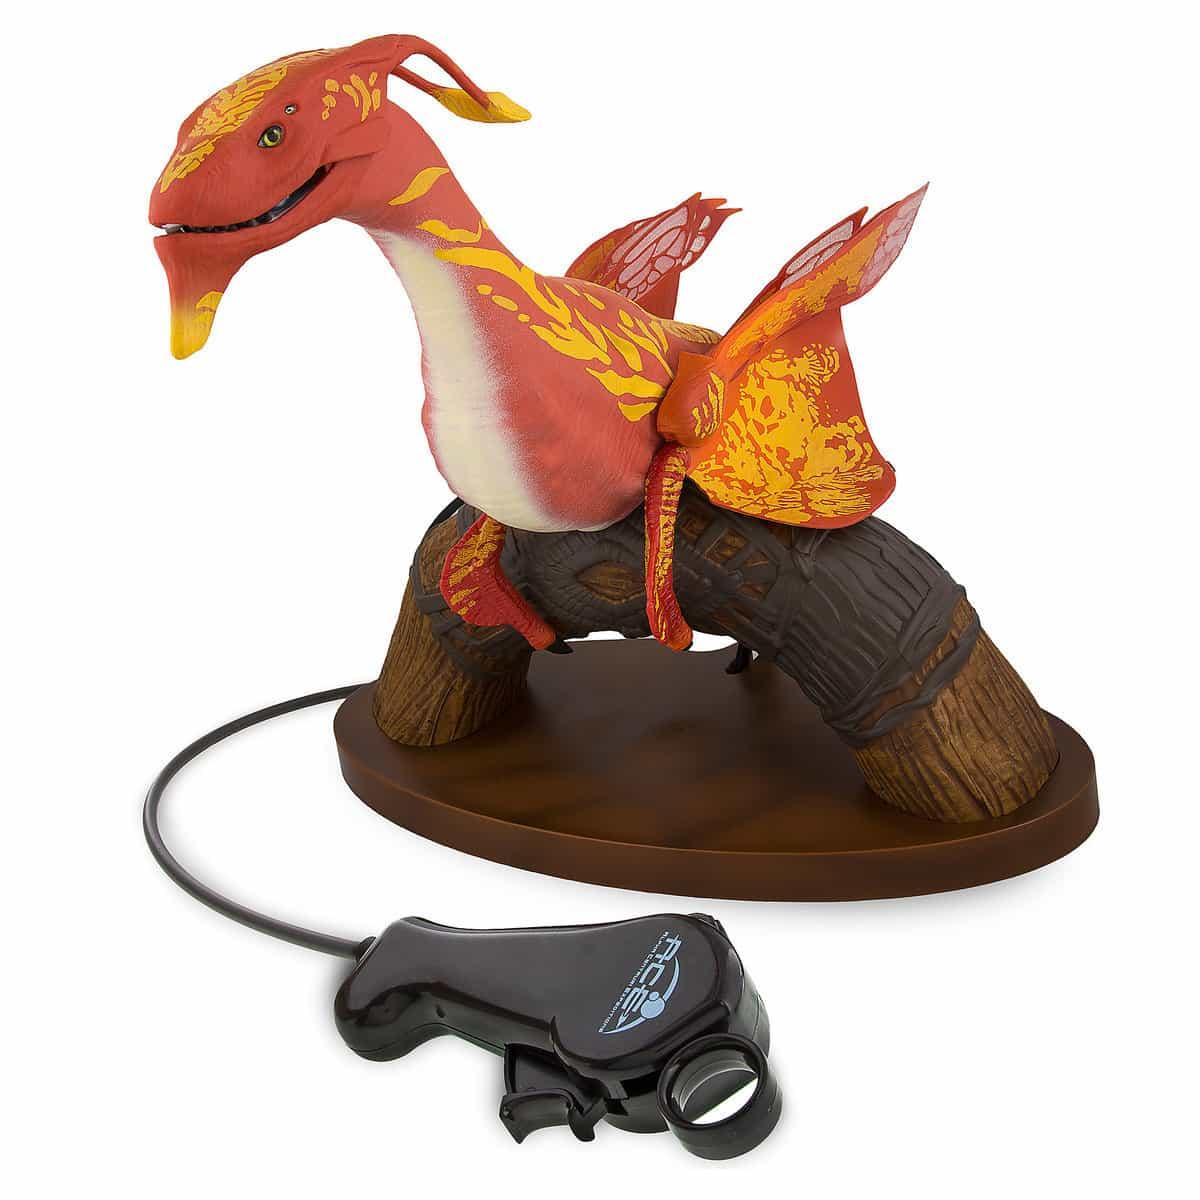 Avatar 2 Toys: The World Of Avatar Interactive Banshee Toy's